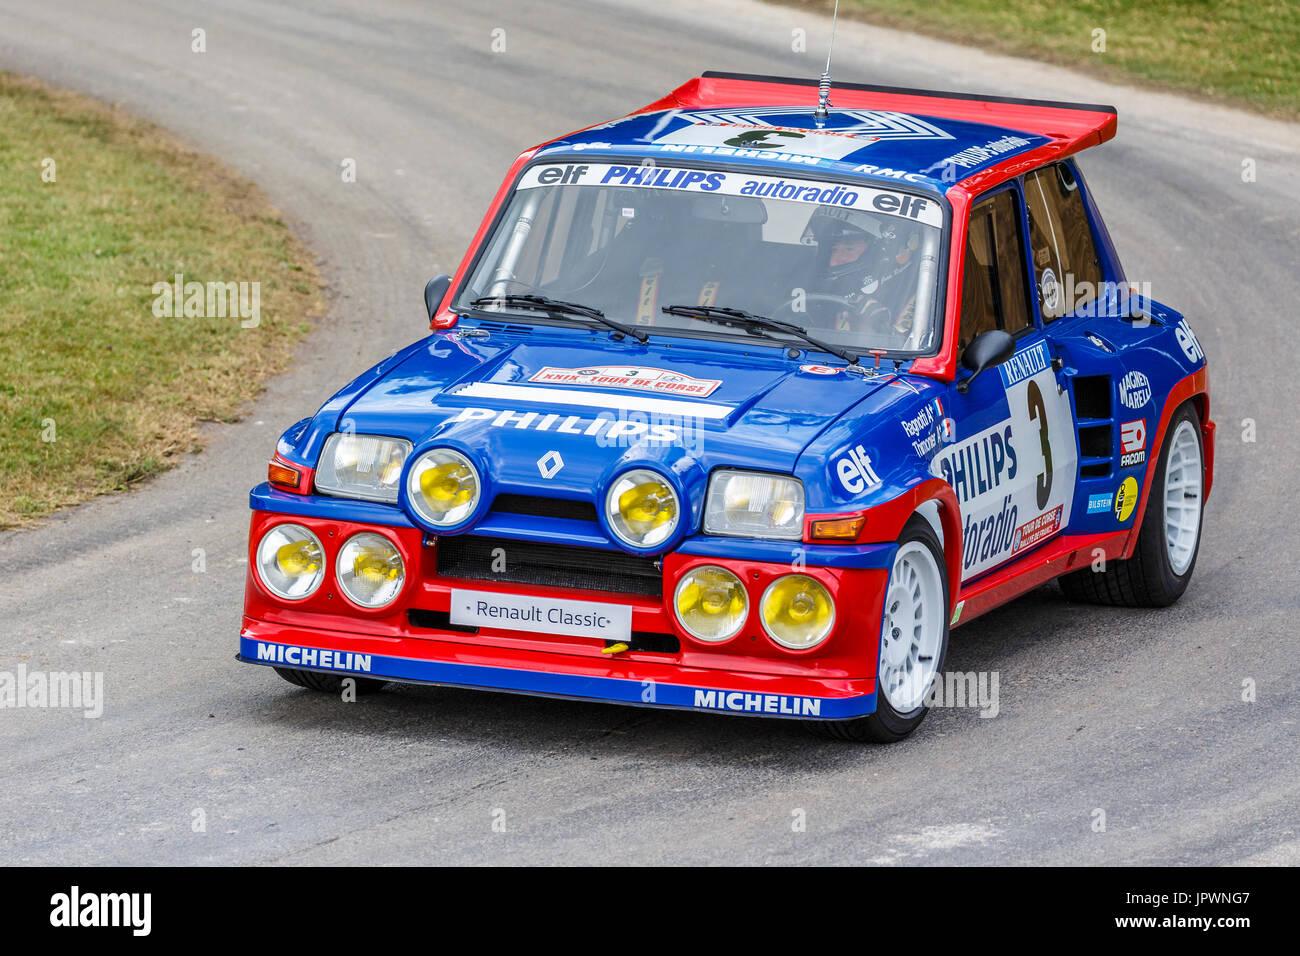 [Image: 1985-renault-5-maxi-turbo-rally-voiture-...jpwng7.jpg]